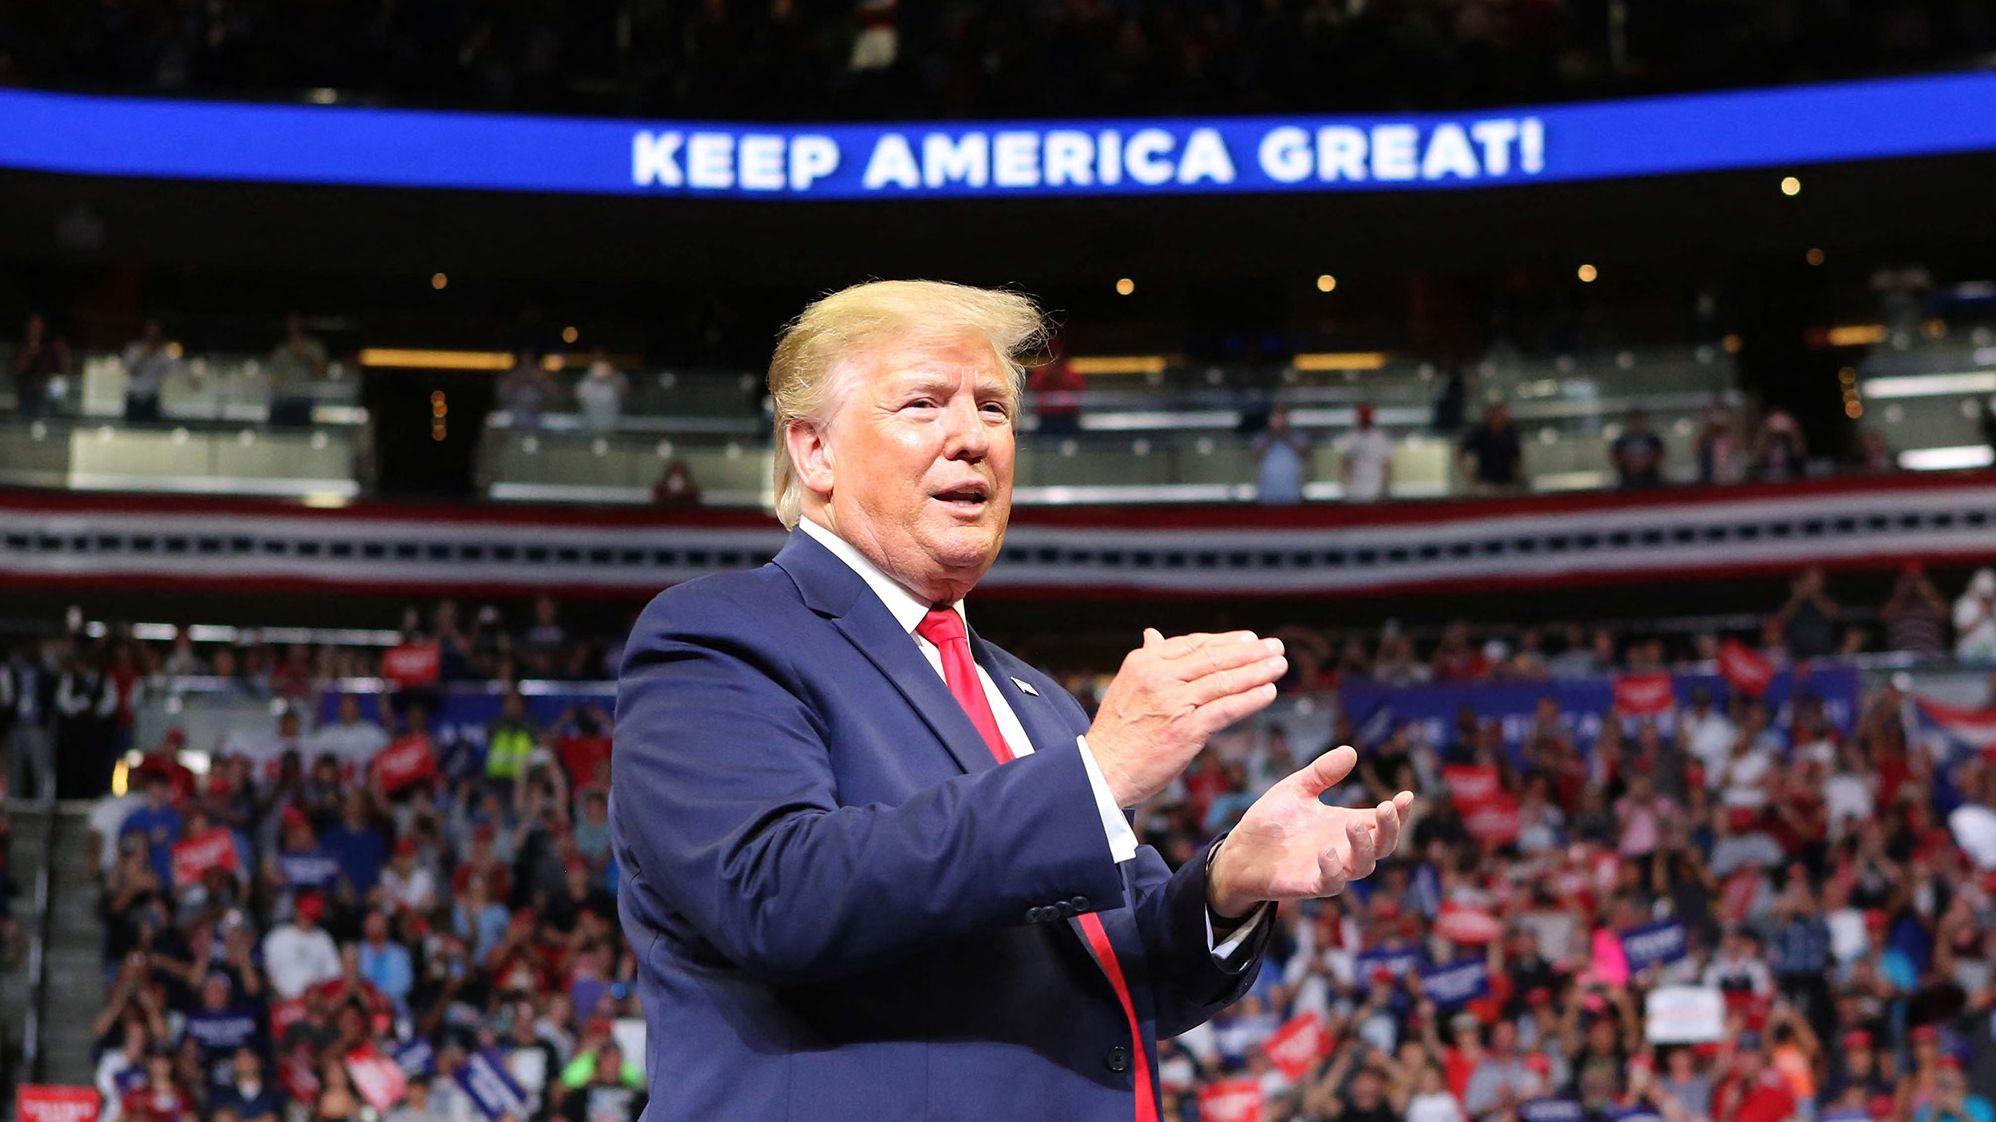 Donald Trump in Orlando